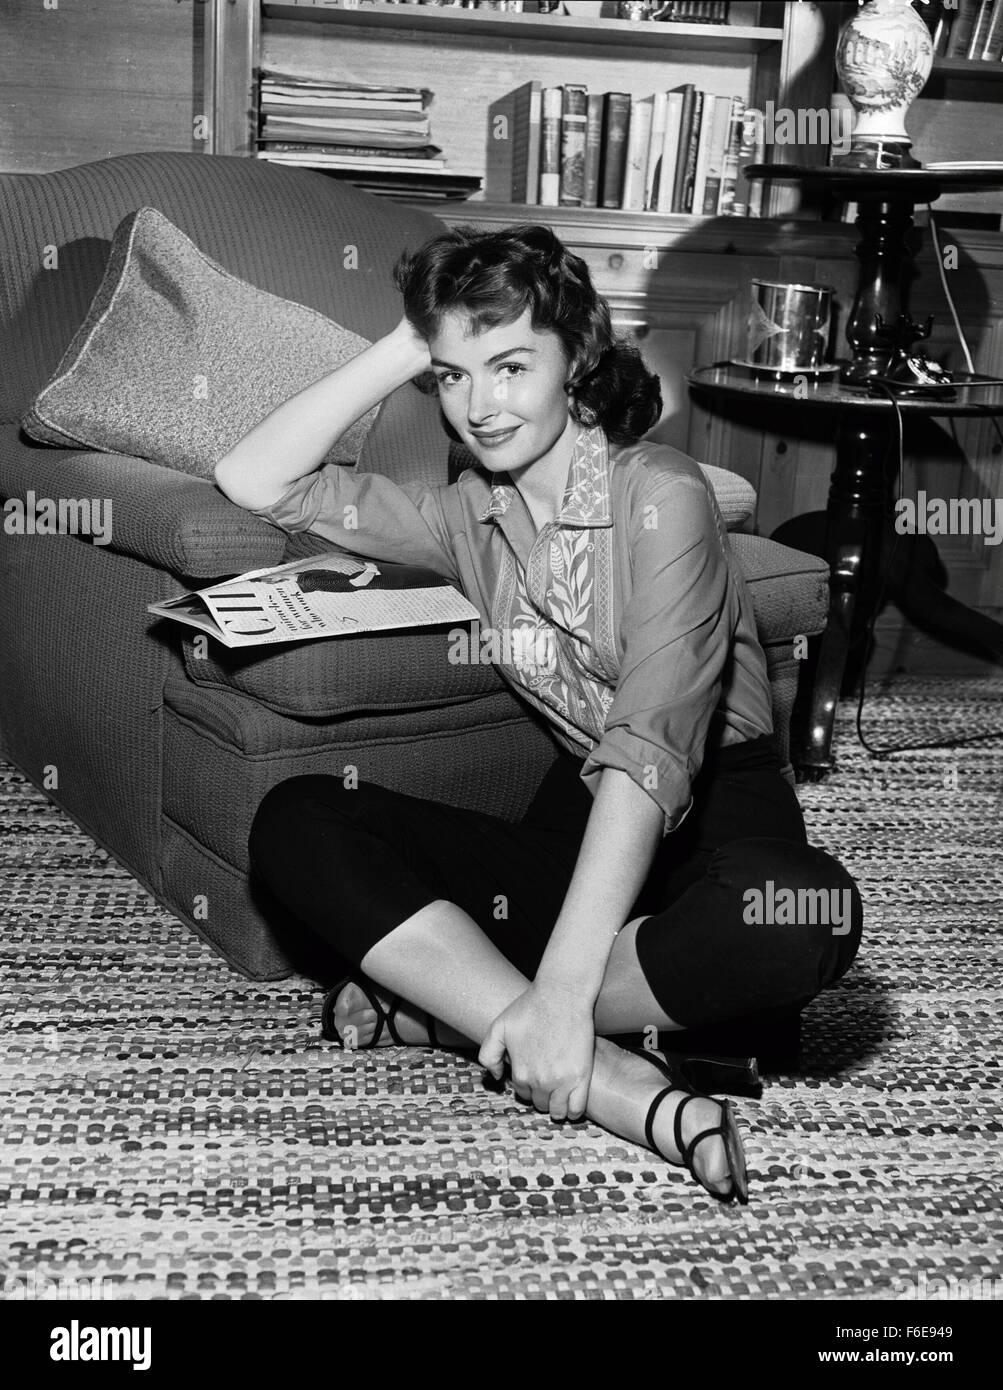 RELEASE DATE: November 18, 1954. MOVIE TITLE: The Last Time I Saw Paris. STUDIO: Metro-Goldwyn-Mayer (MGM). PLOT: - Stock Image